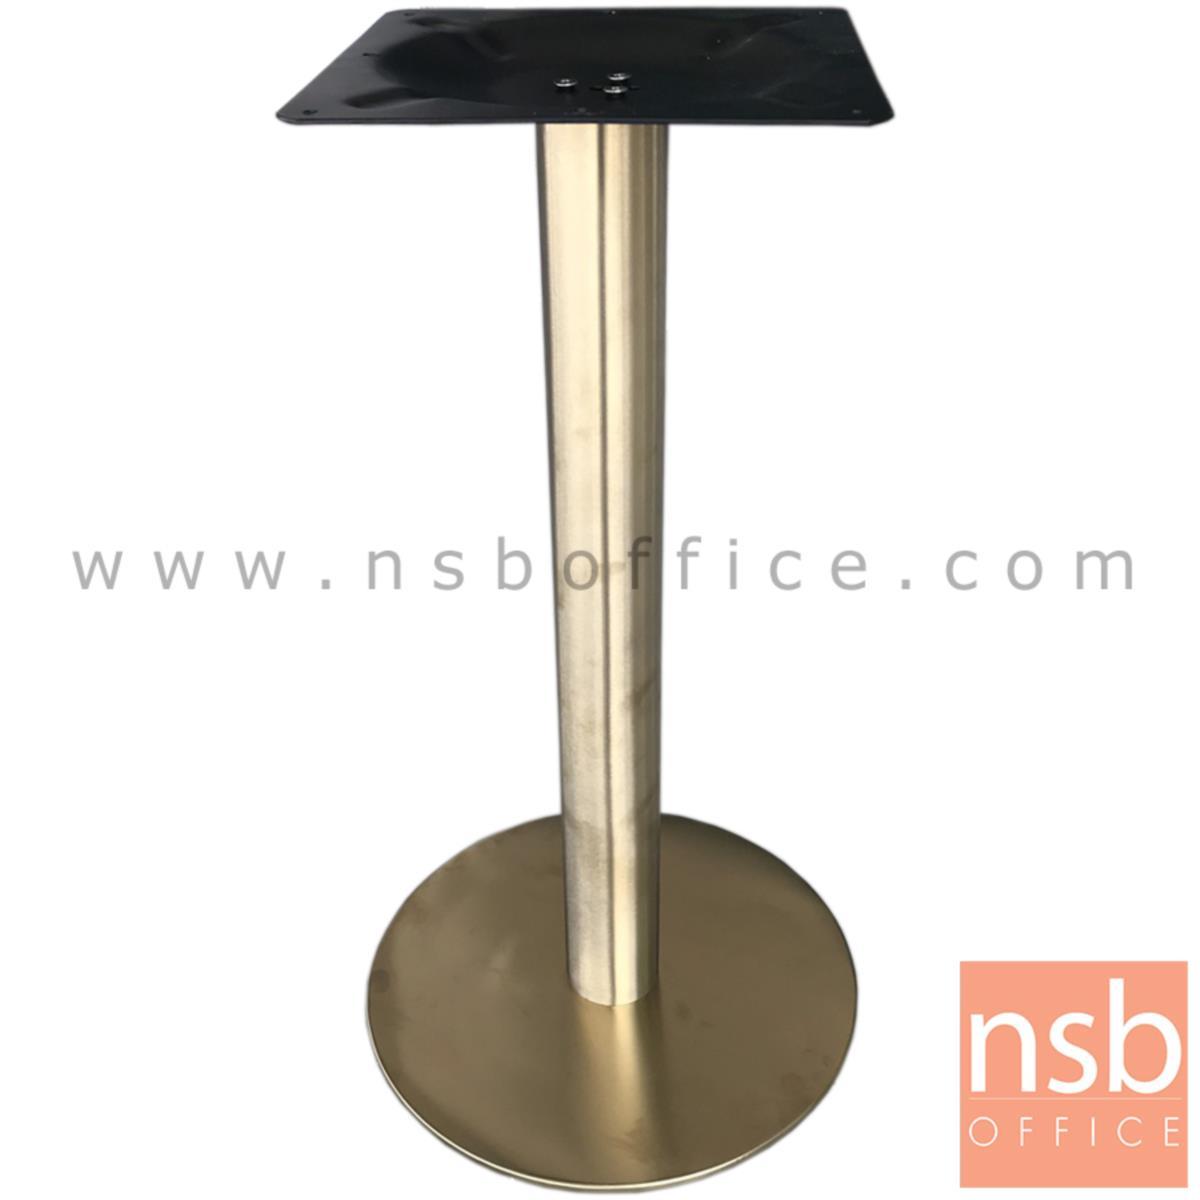 A14A225:ขาโต๊ะบาร์จานกลม (สีทอง hairline)